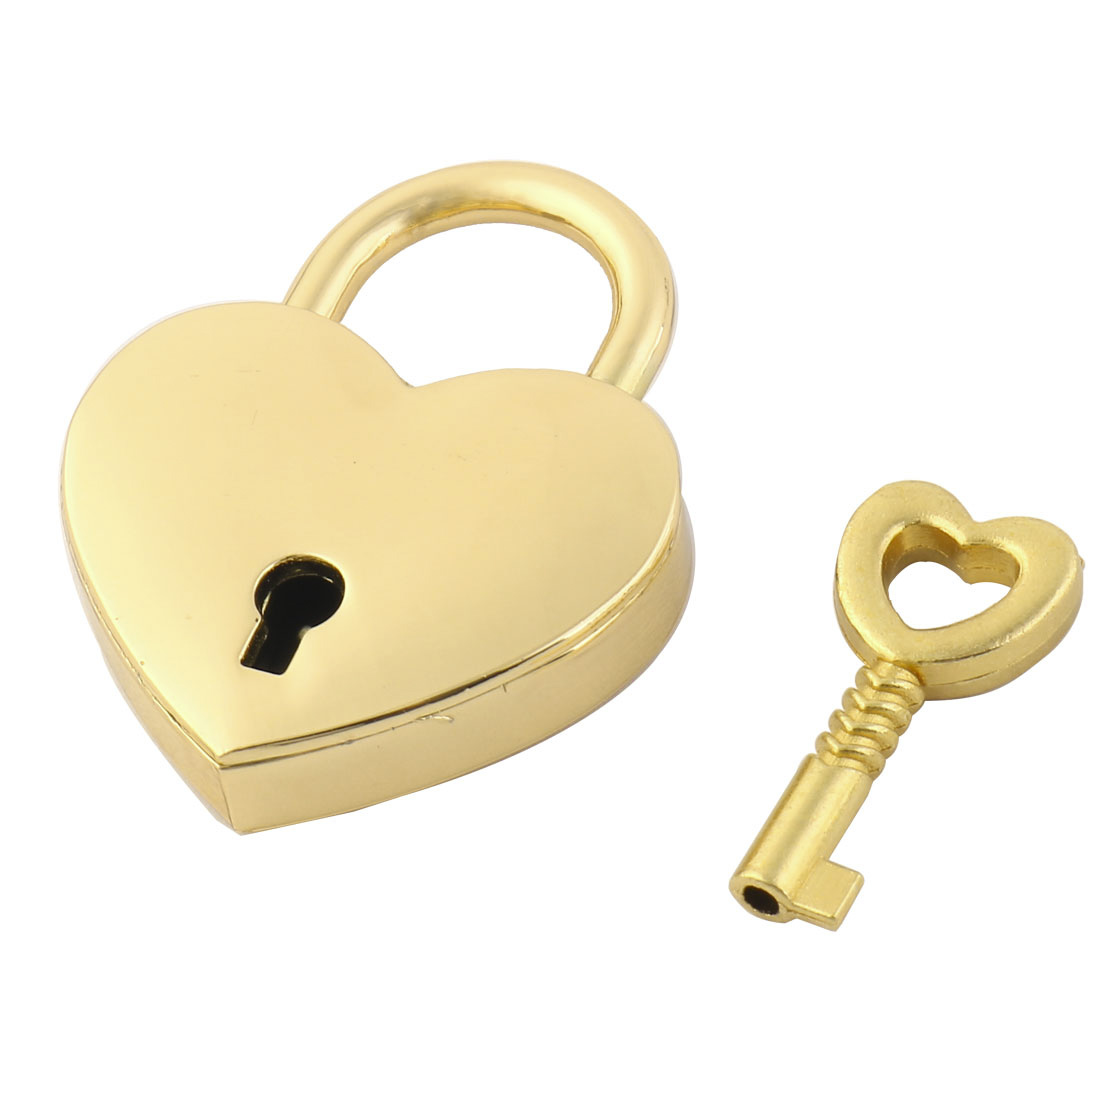 Luggage Bag Metal Heart Shaped Security Lock Padlock Gold Tone w Skeleton Key